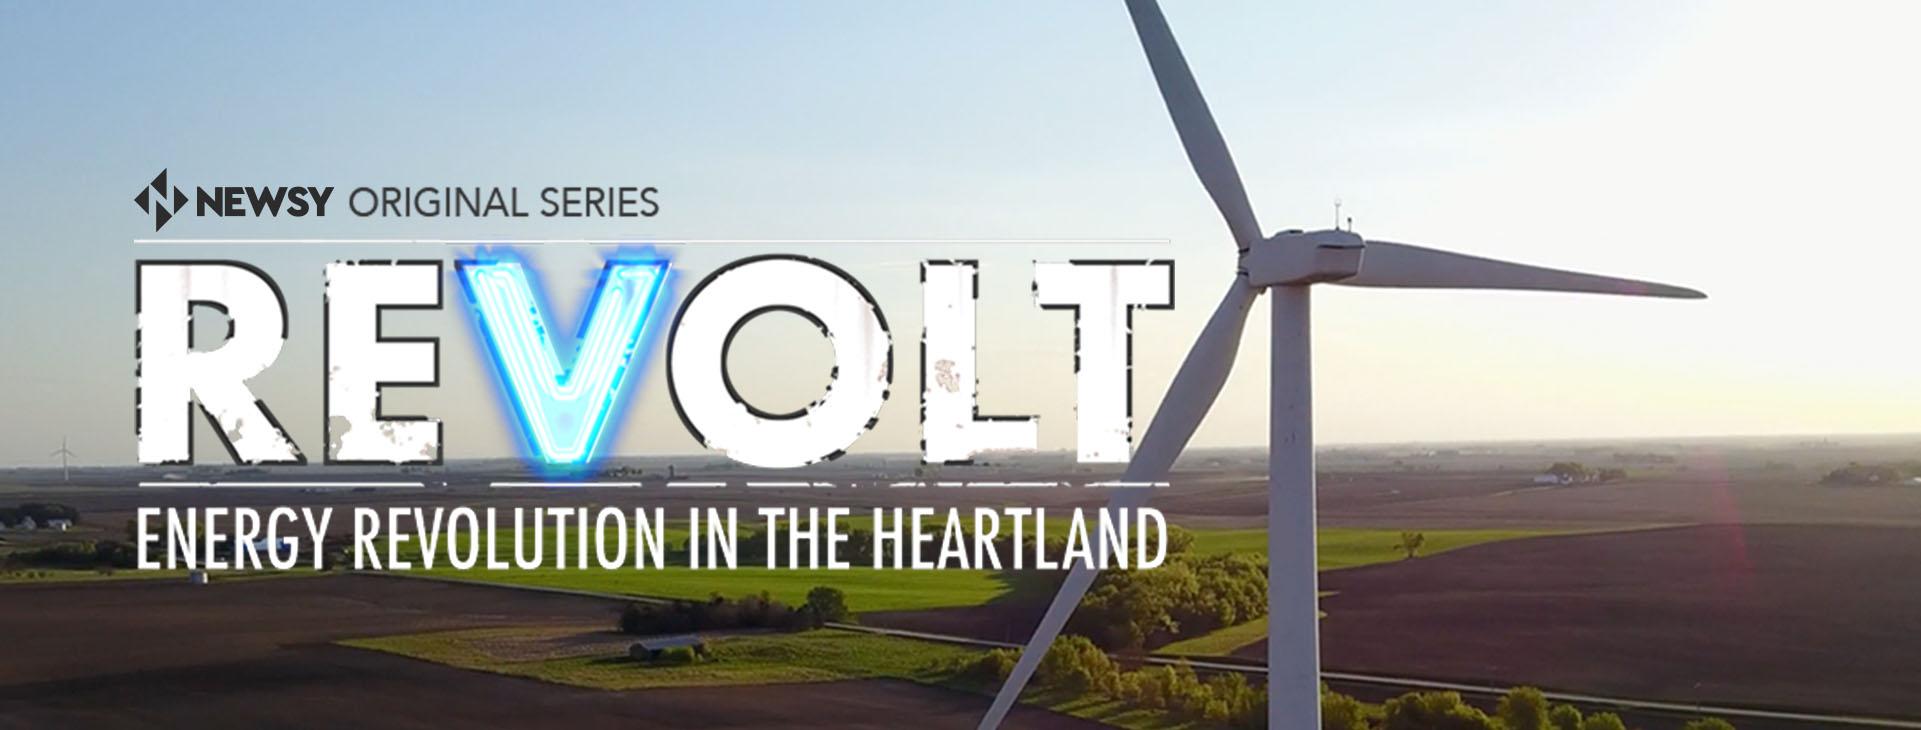 Revolt: Energy Revolution in the Heartland